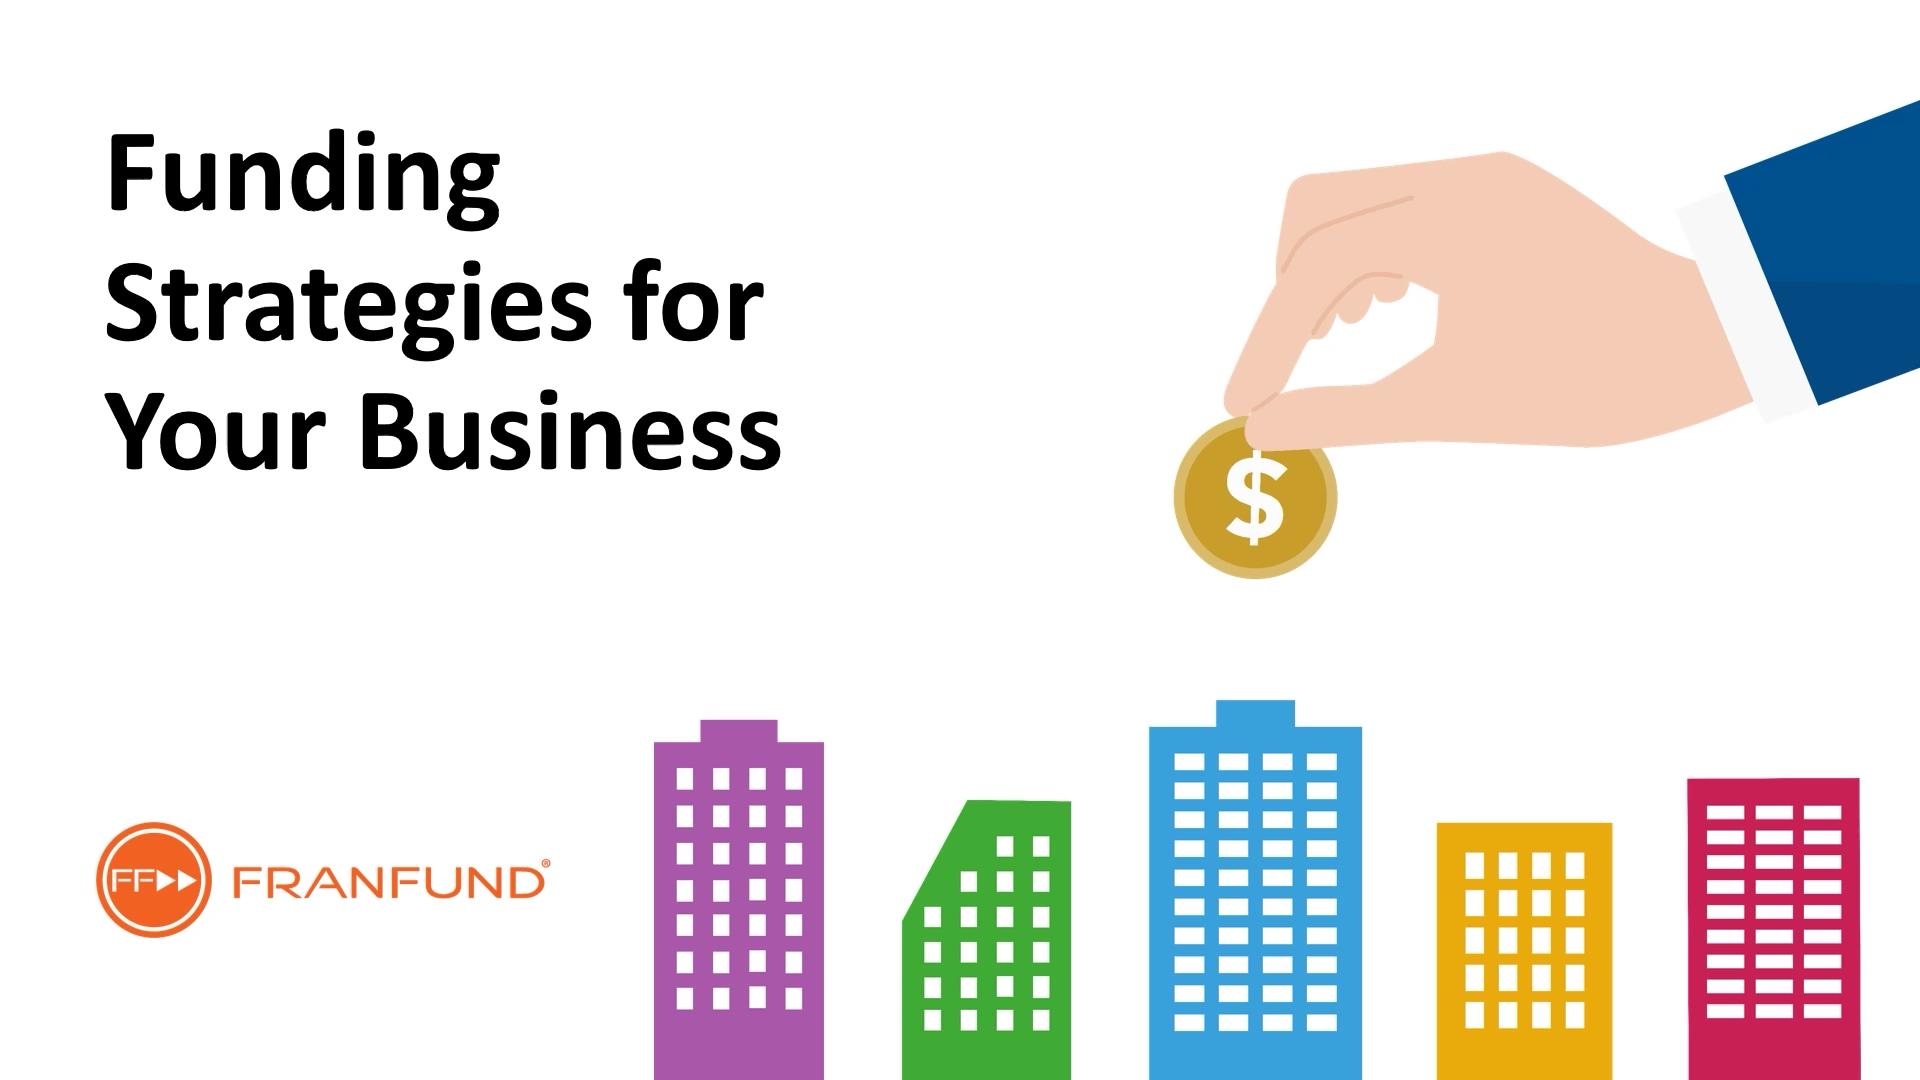 FranFund Funding Strategies Video_Final.2021